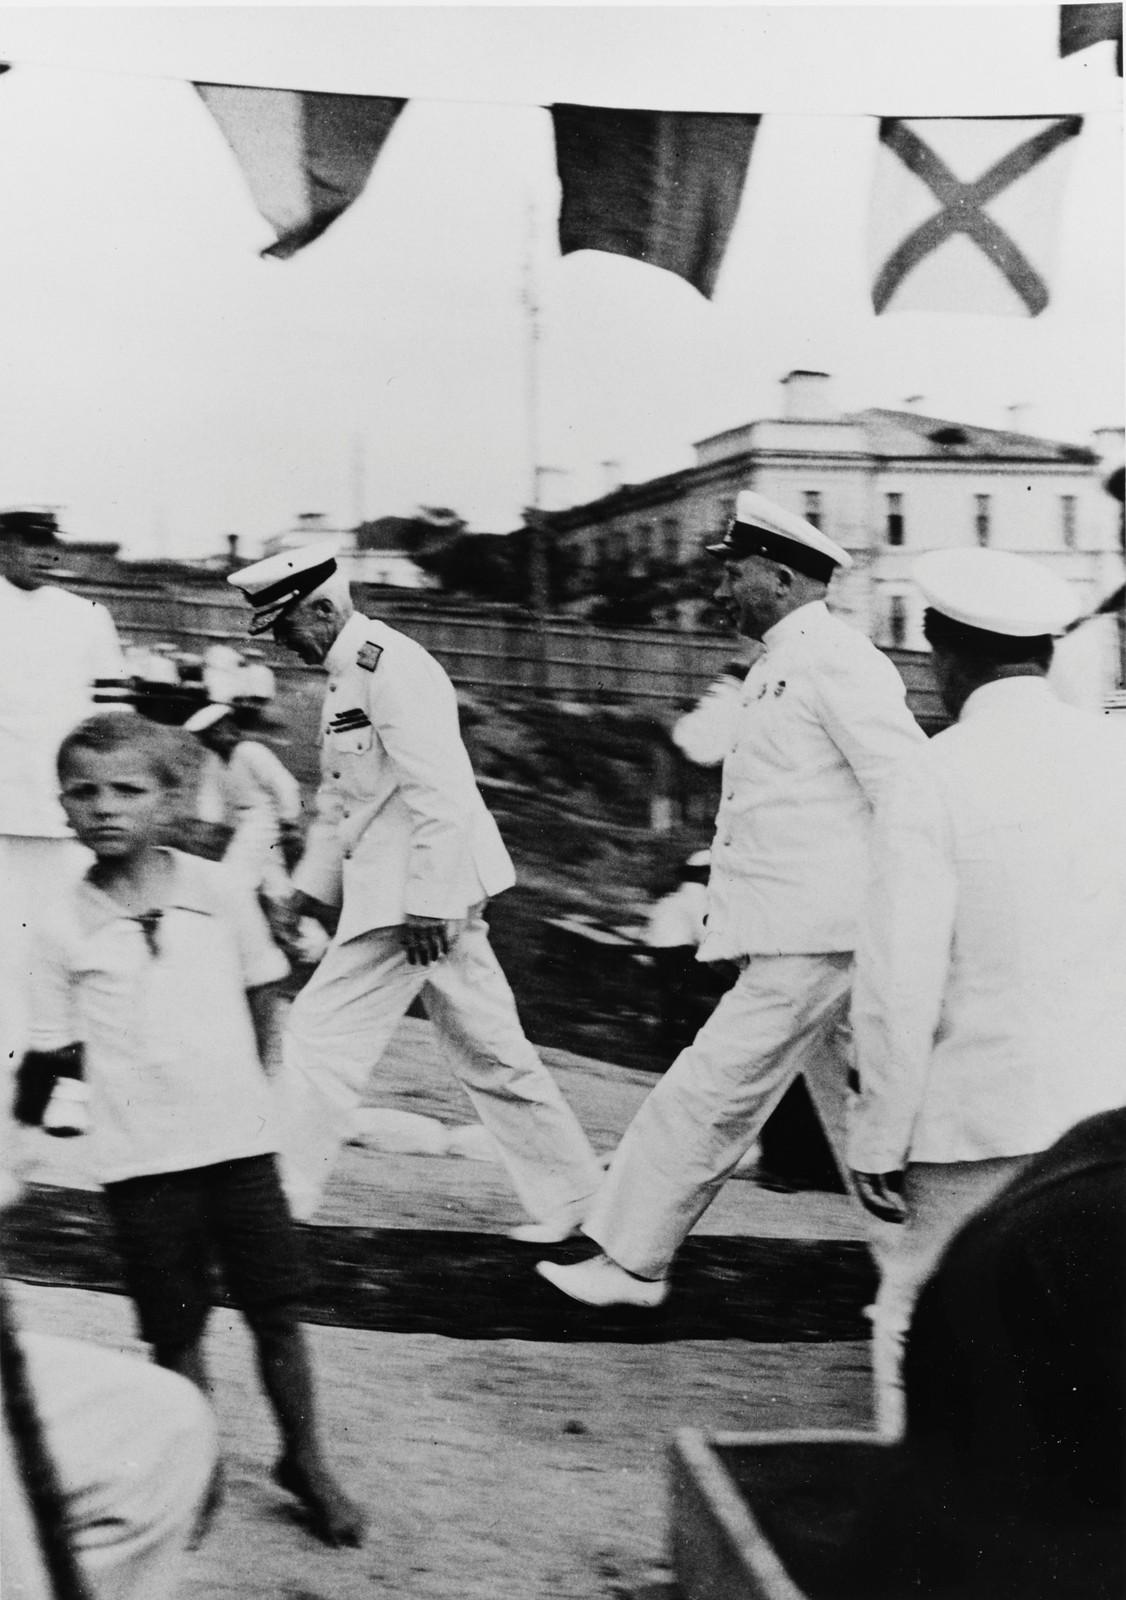 Командующий Тихоокеанским флотом флагман 1 ранга Г. Киреев и адмирал Ярнелл. 29 июля